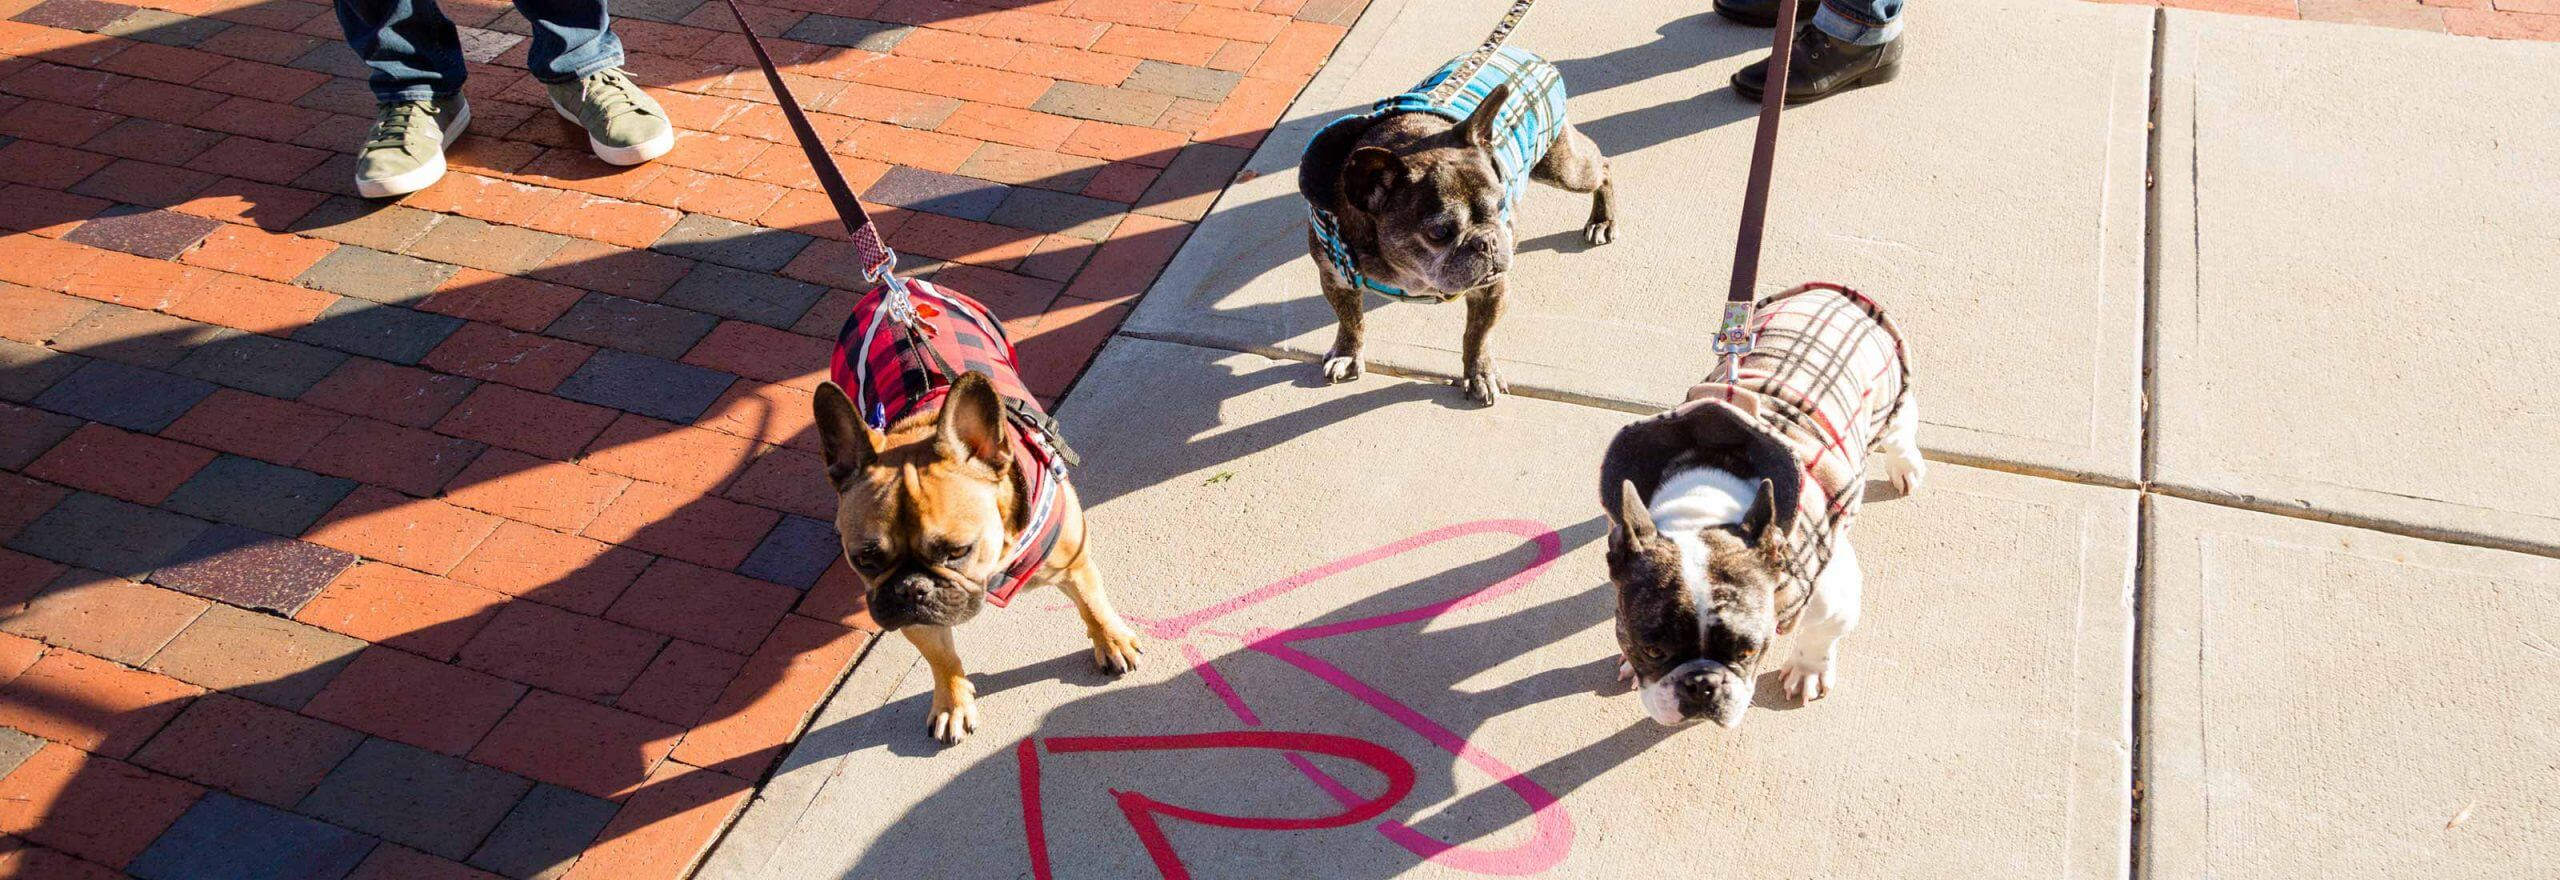 Dogs on a leash on the sidewalk